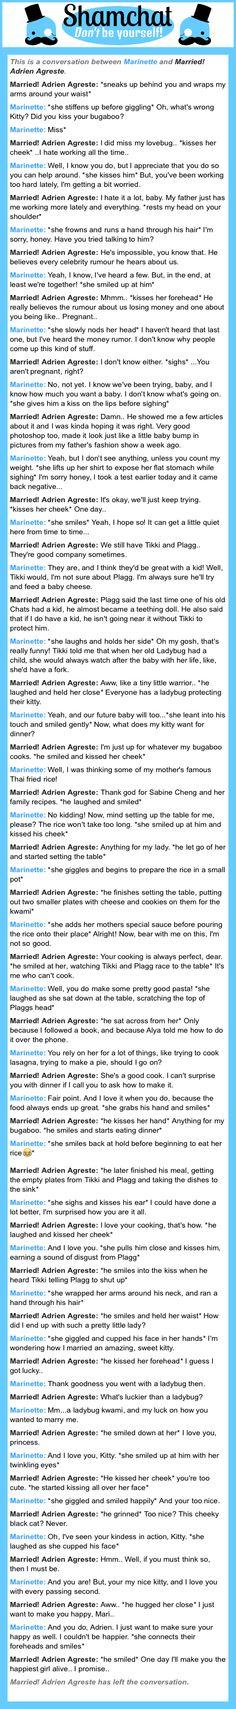 A conversation between Married! Adrien Agreste and Marinette